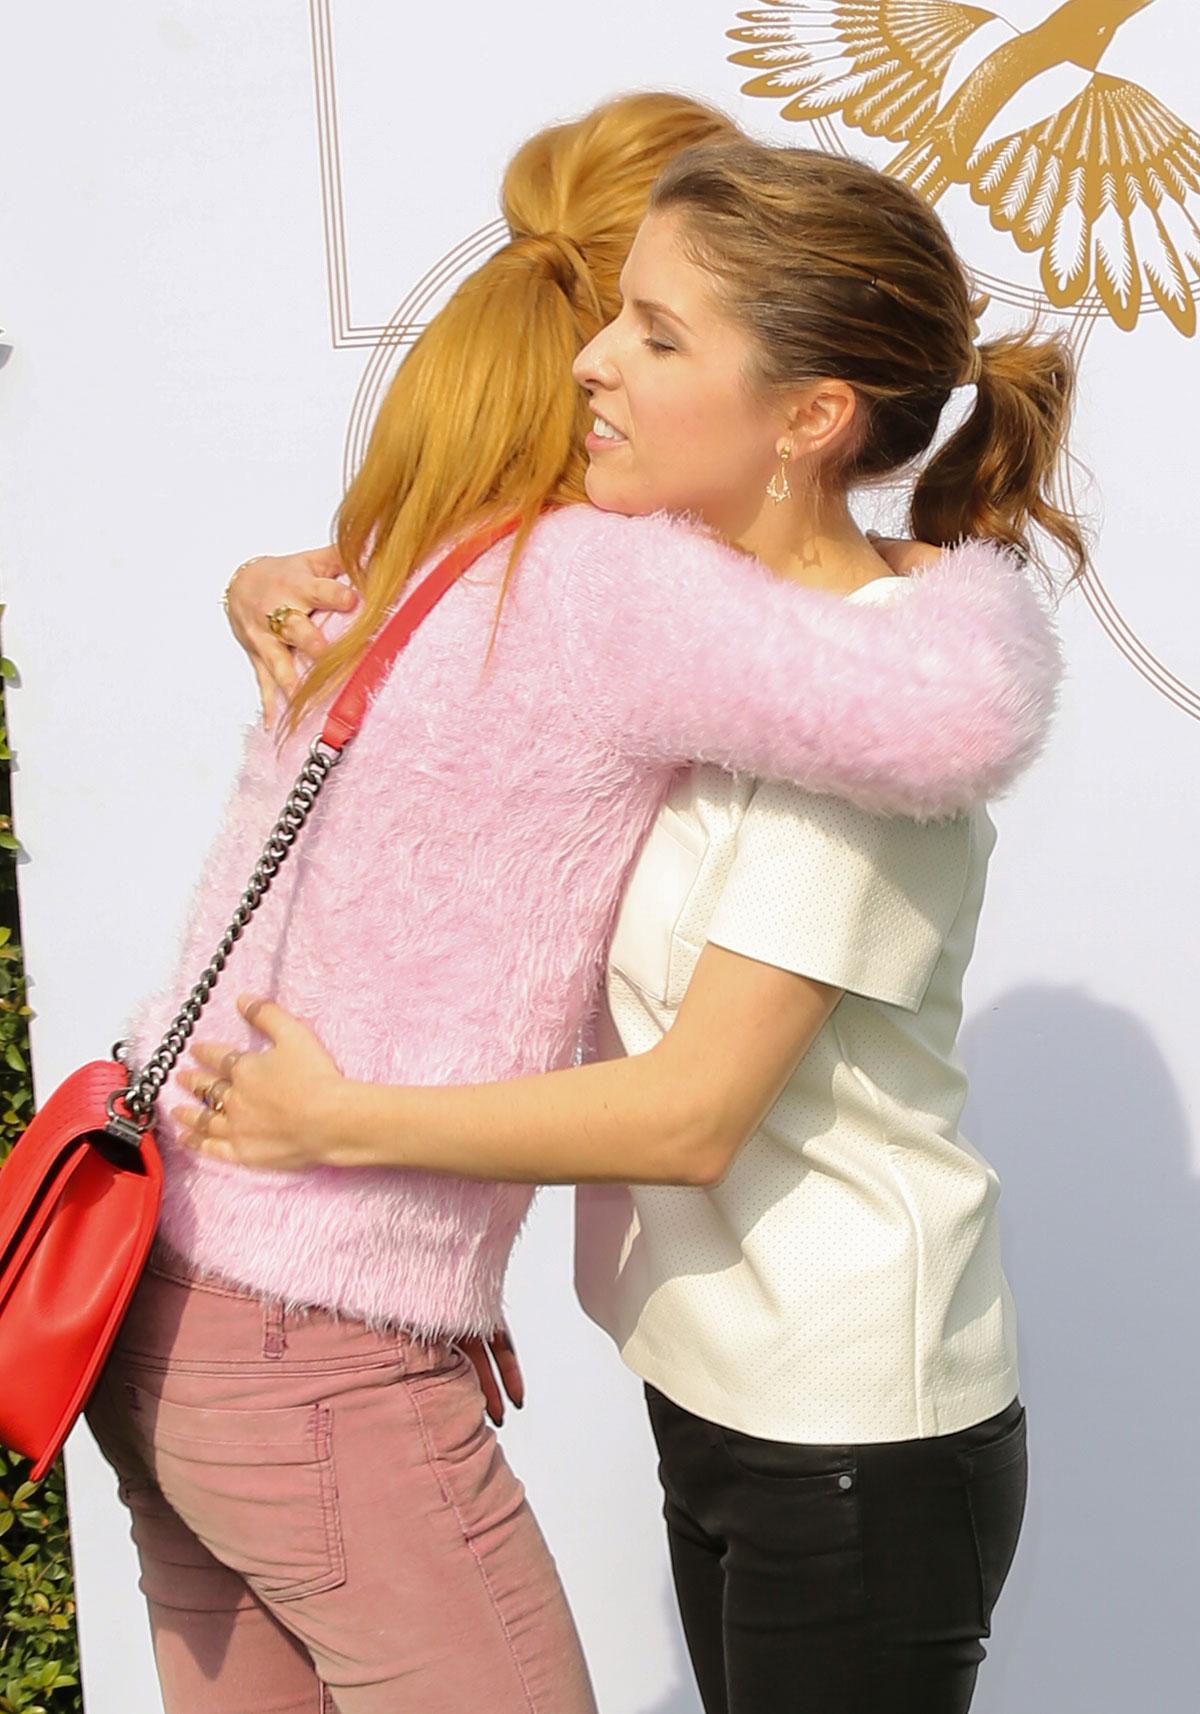 Anna Kendrick attends LOVEGOLD Luncheon celebrating Michelle Dockery